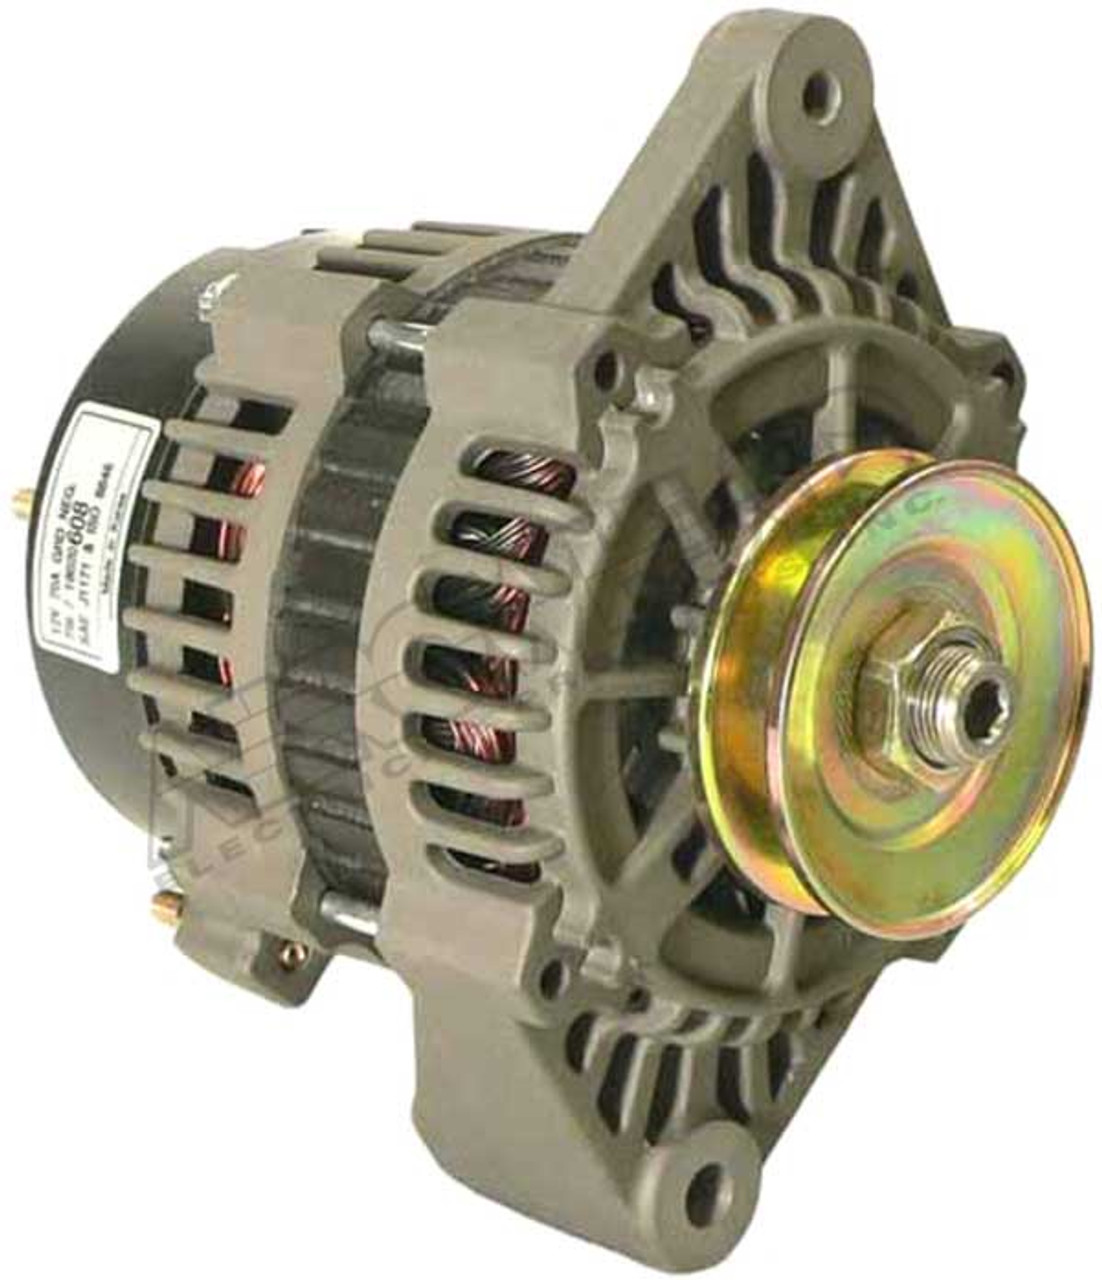 Alternator for 7SI Marine Applications IR/IF, 12-Volt, 70 Amp ADR0298